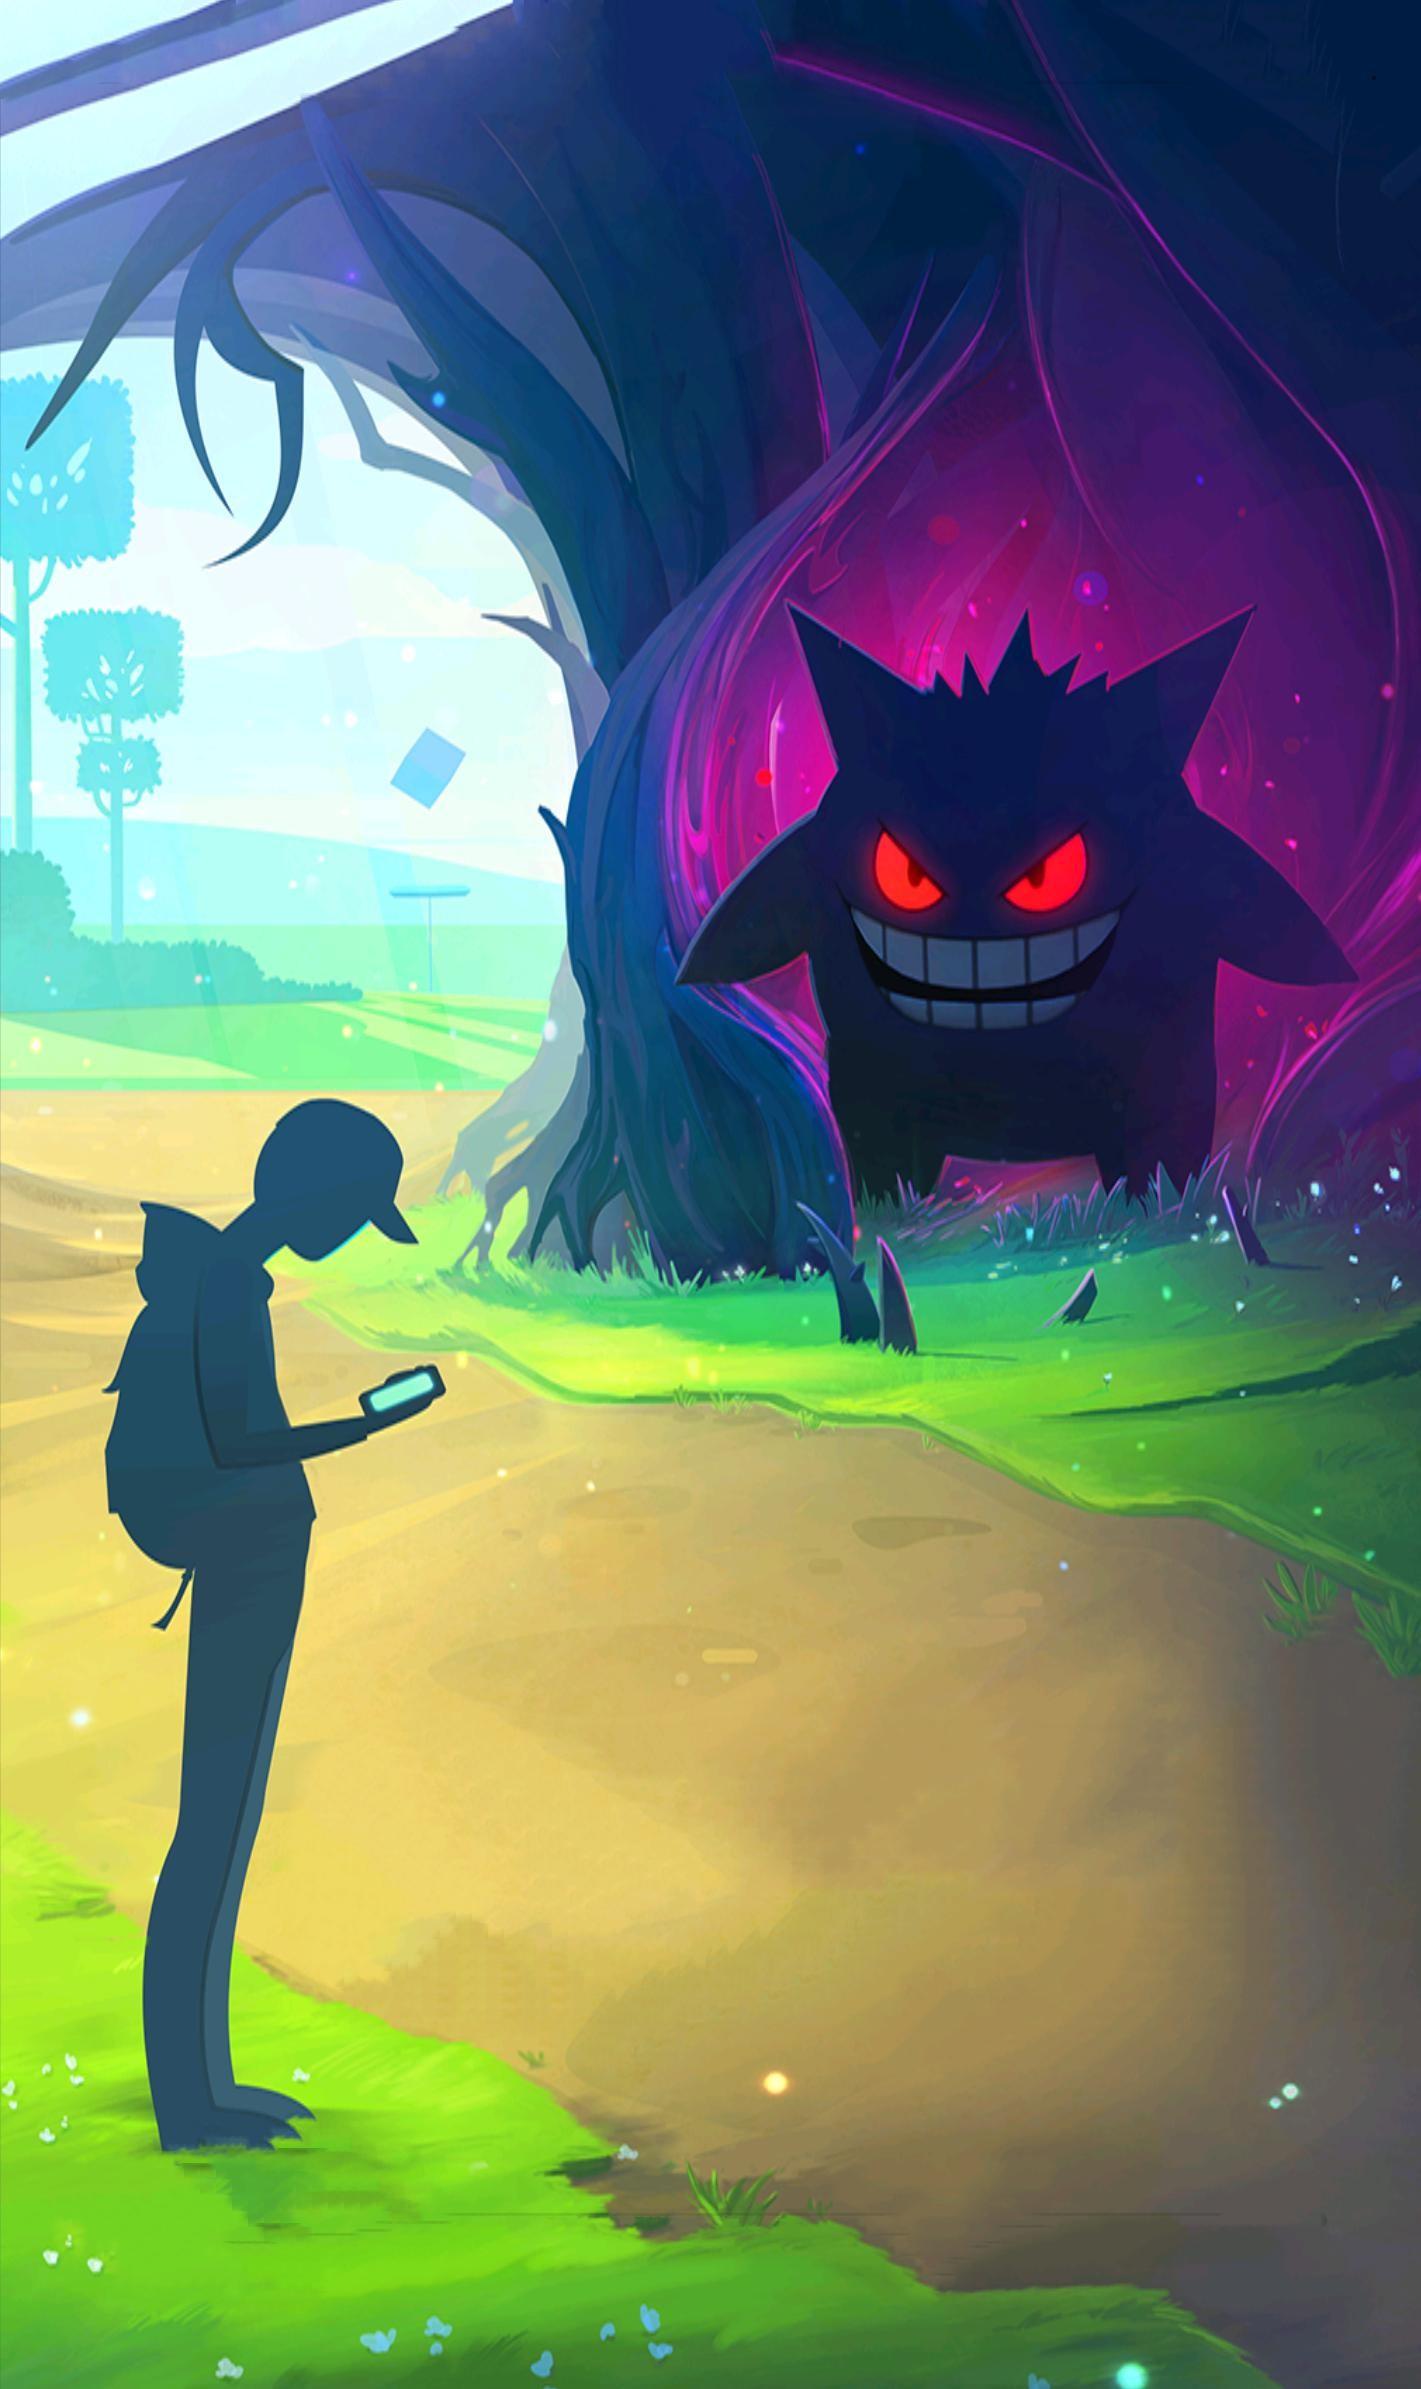 Res: 1421x2389, Pokemon GO Halloween Wallpaper